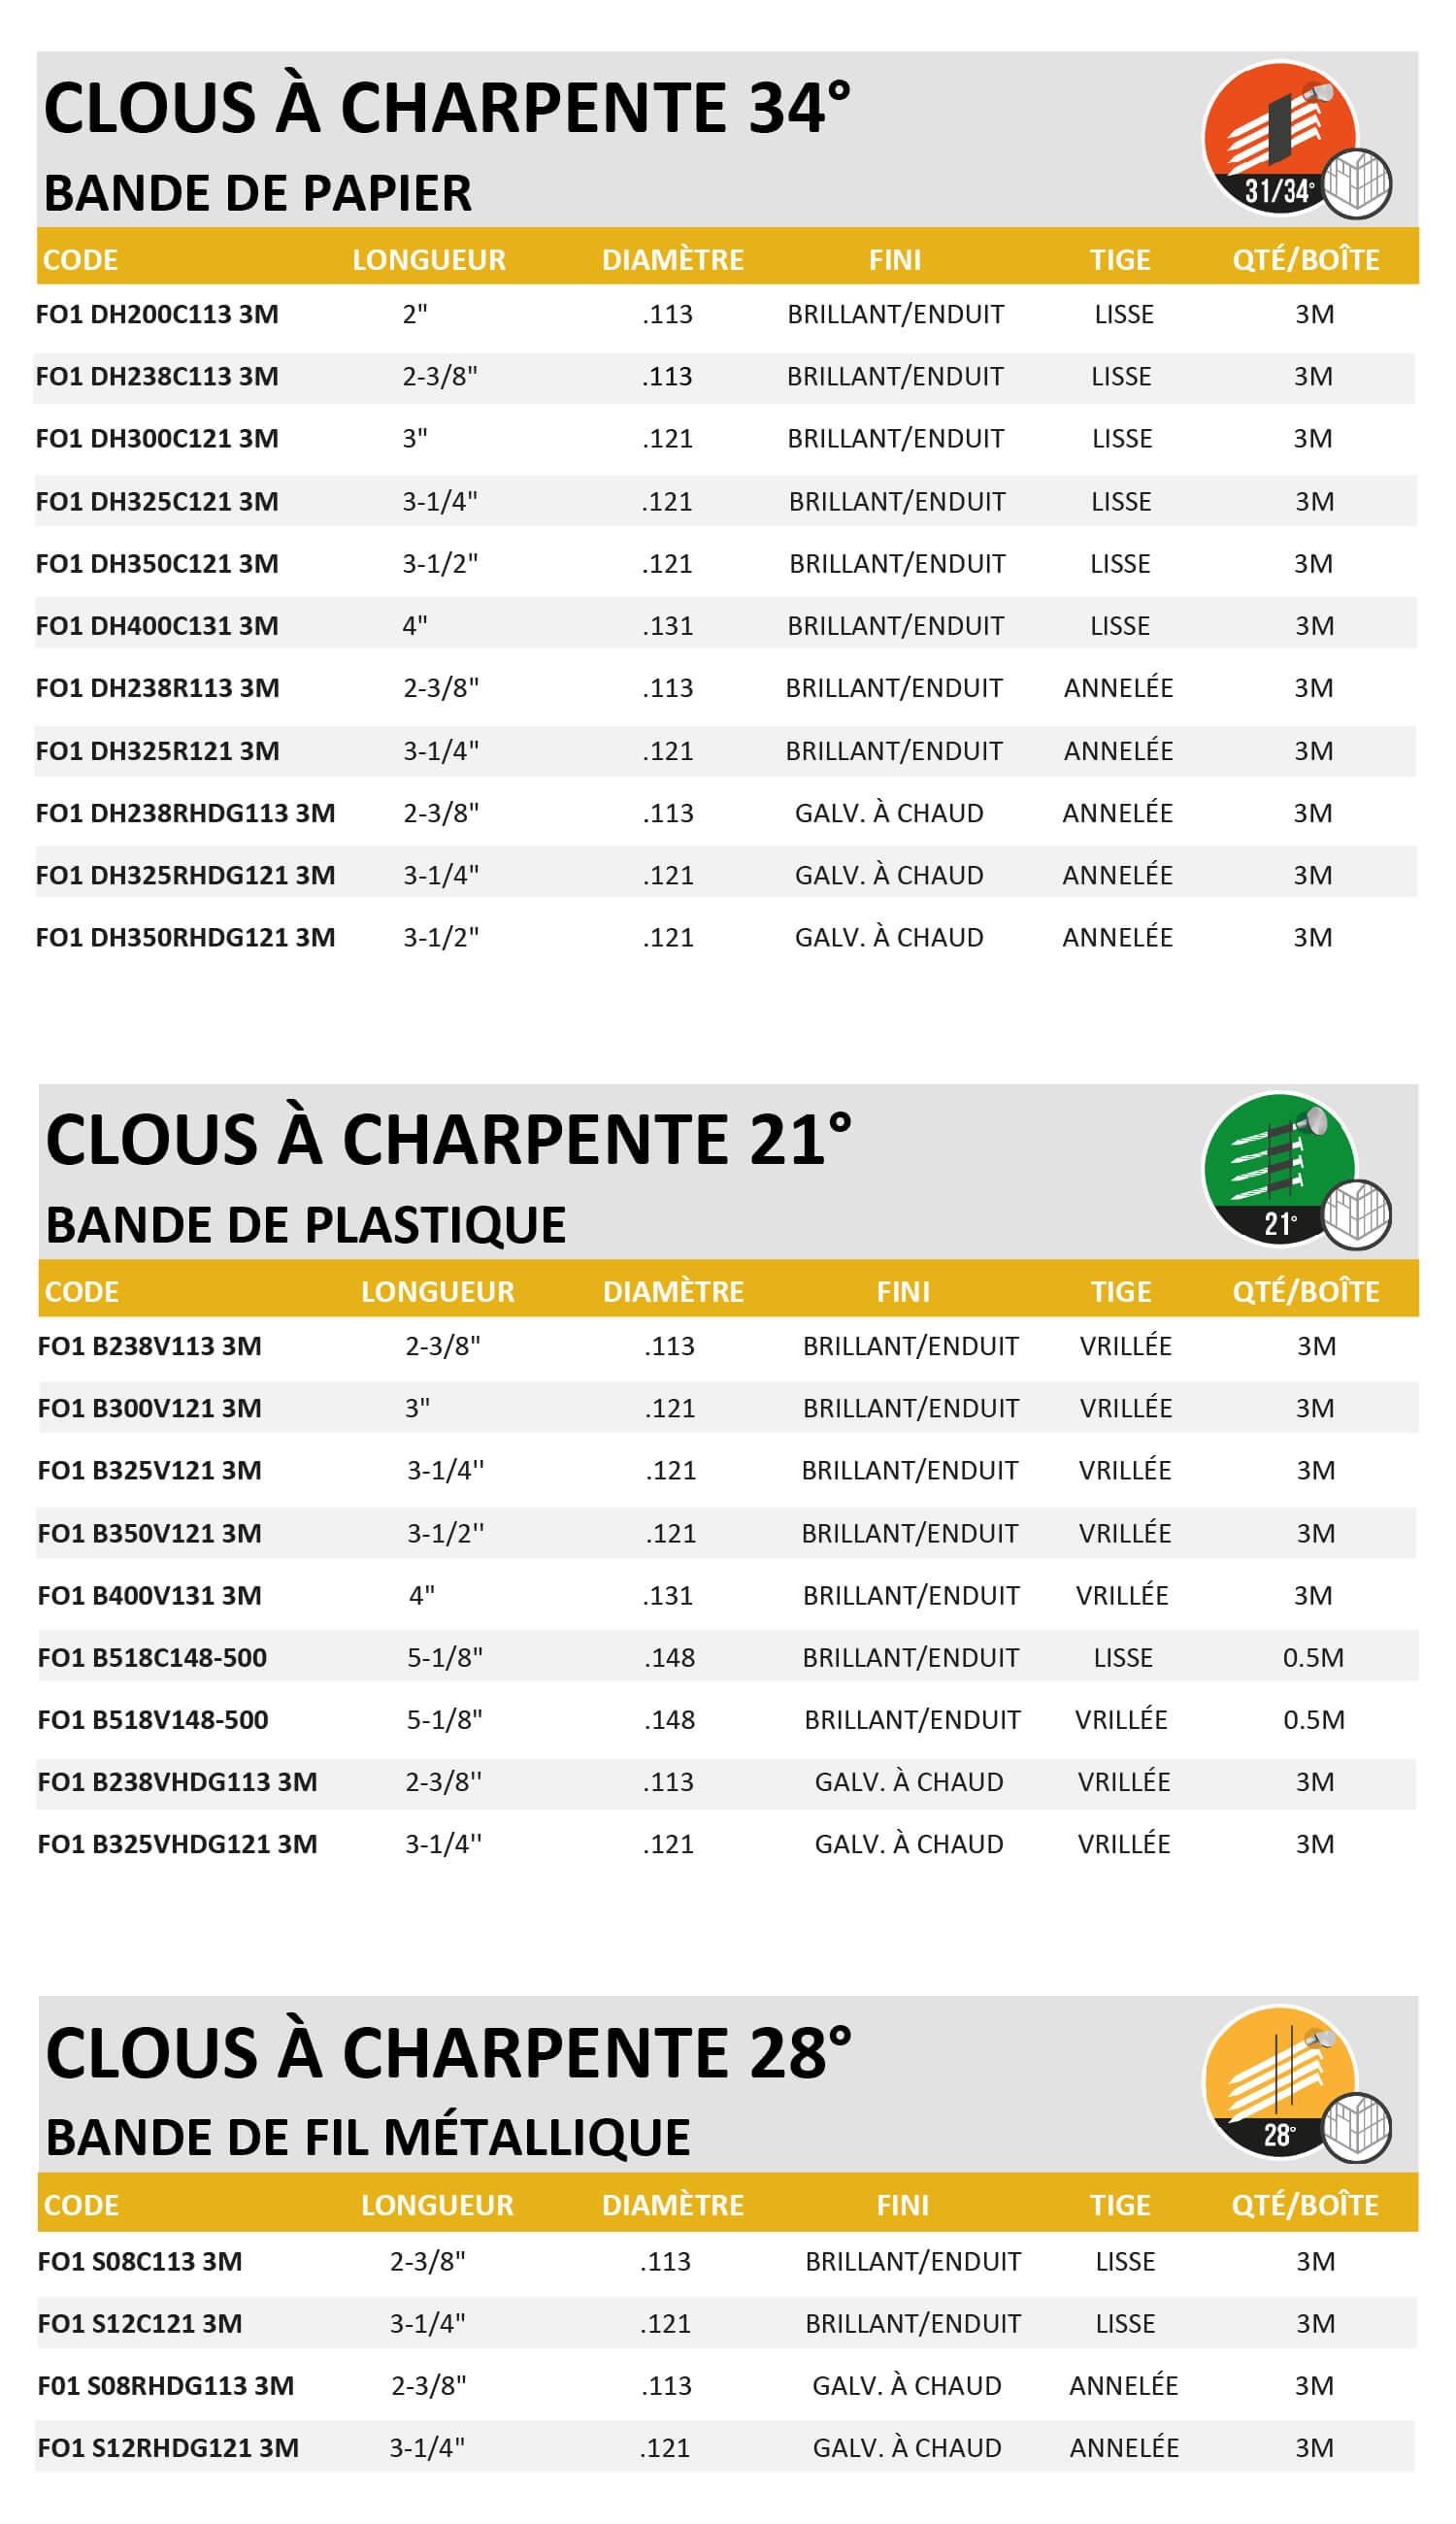 203-clous-a-charpente-en-bandes-foresto-bf